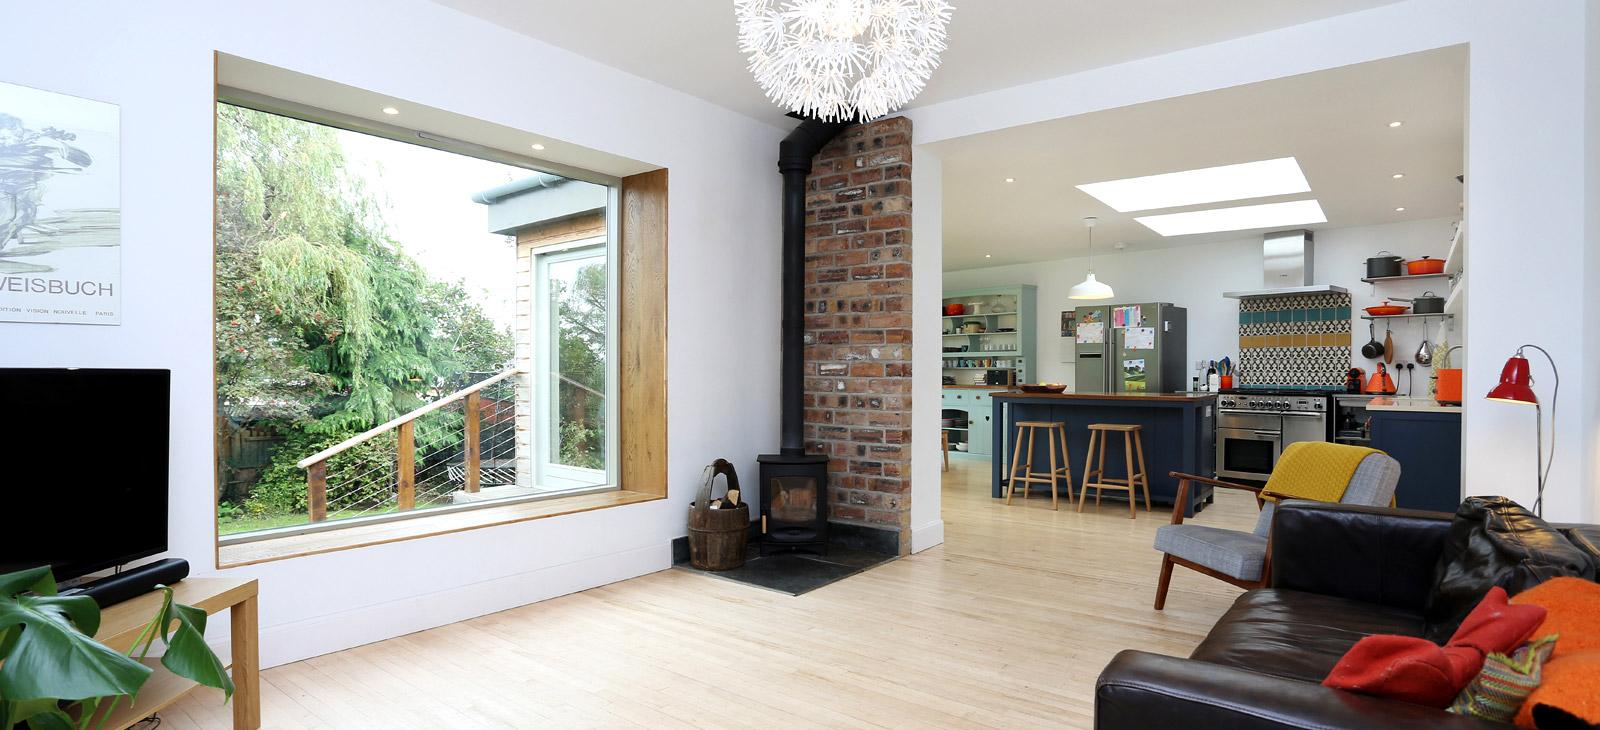 Renovations, alterations & home improvement services by Cramond (Edinburgh).